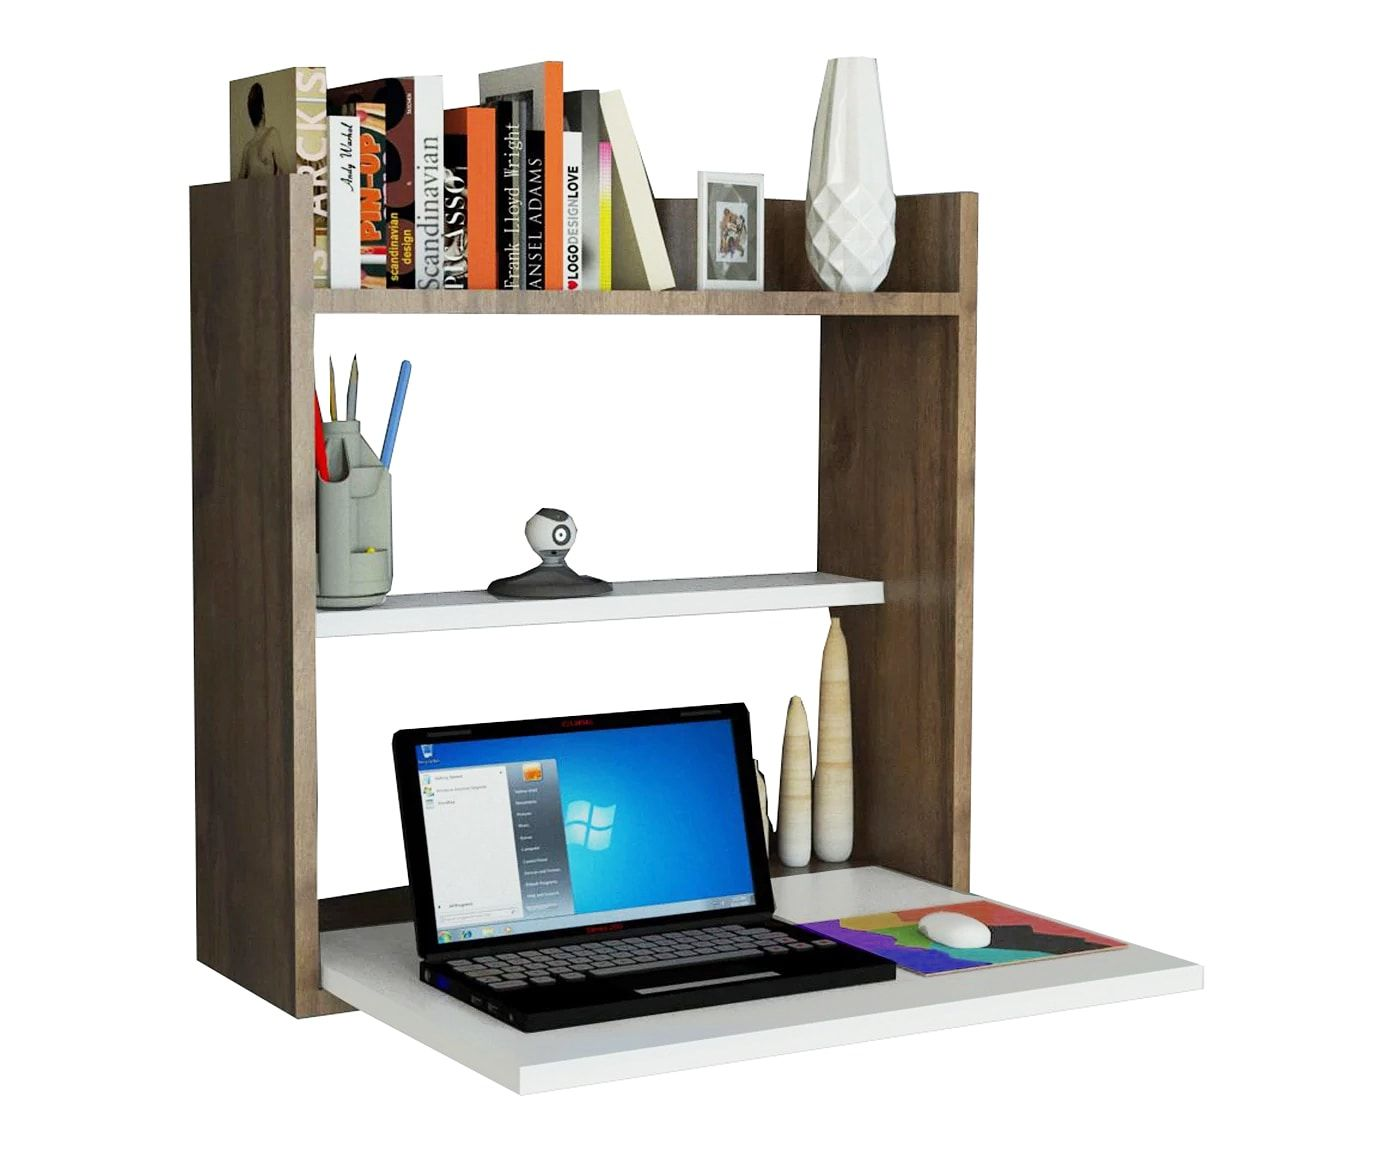 Scrivania a scomparsa Laptop | Dalani Home & Living | idee&soluzioni ...